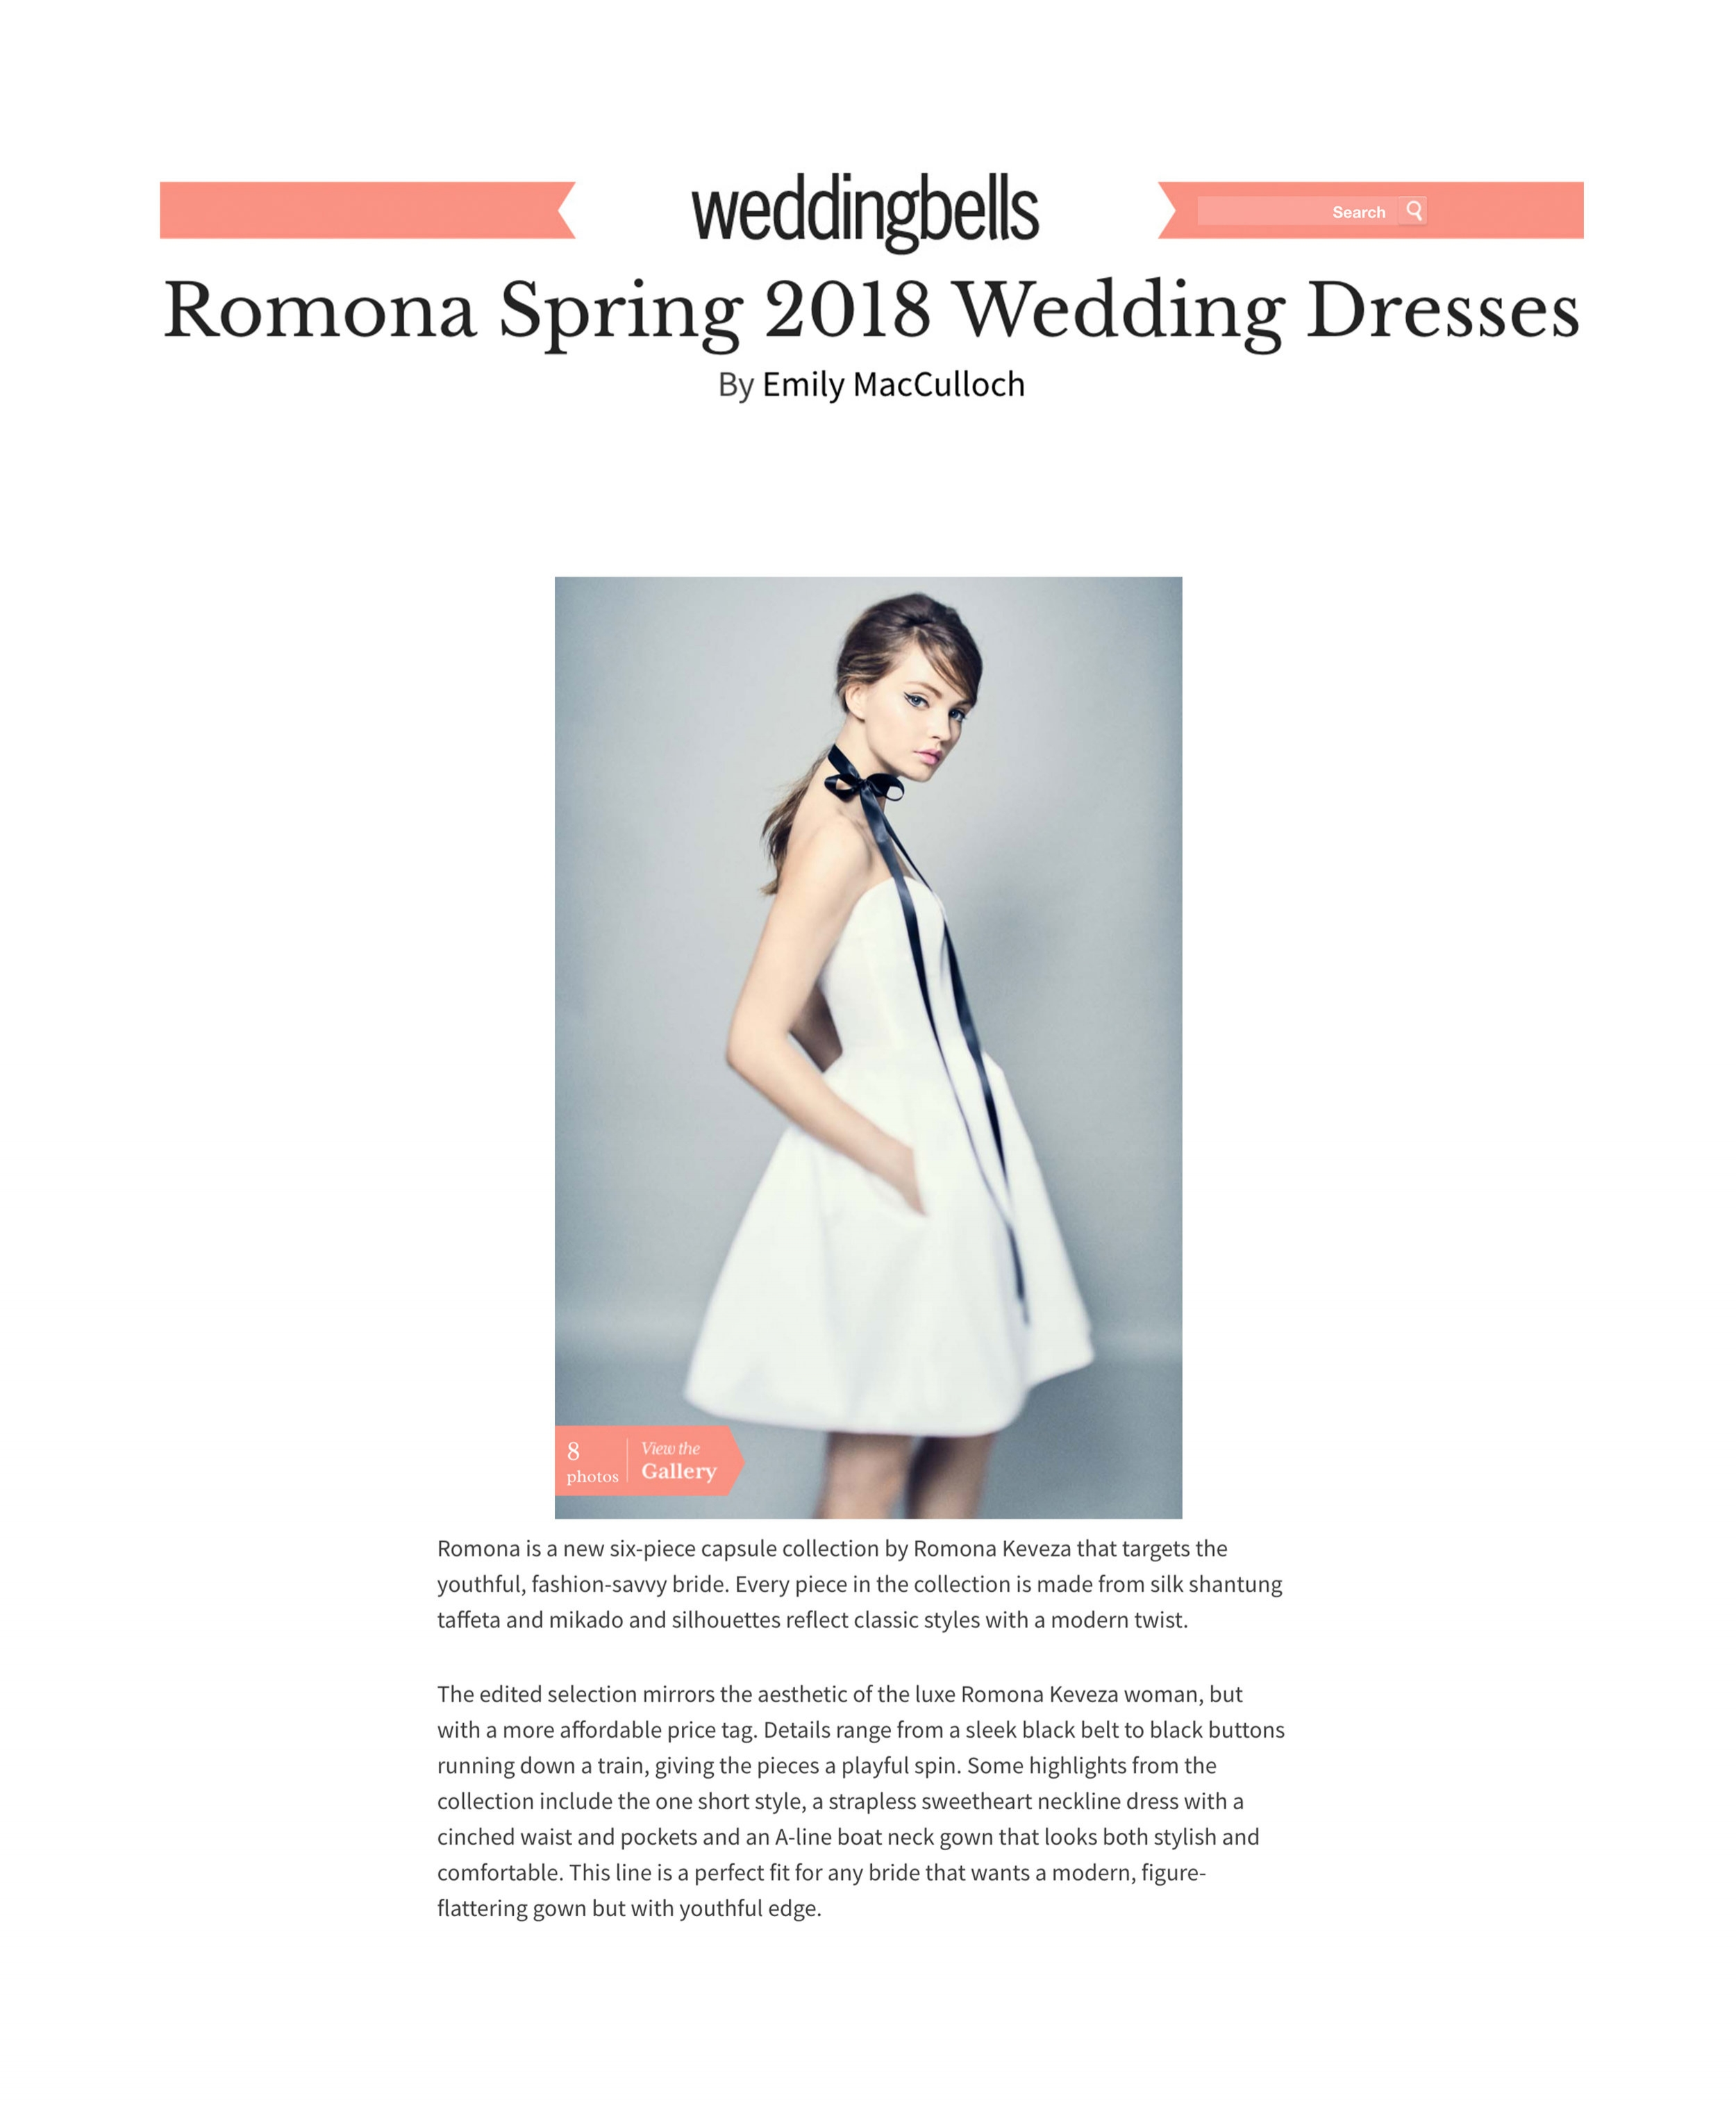 ROMONA_PressKit_WeddingBellsPG2.jpg